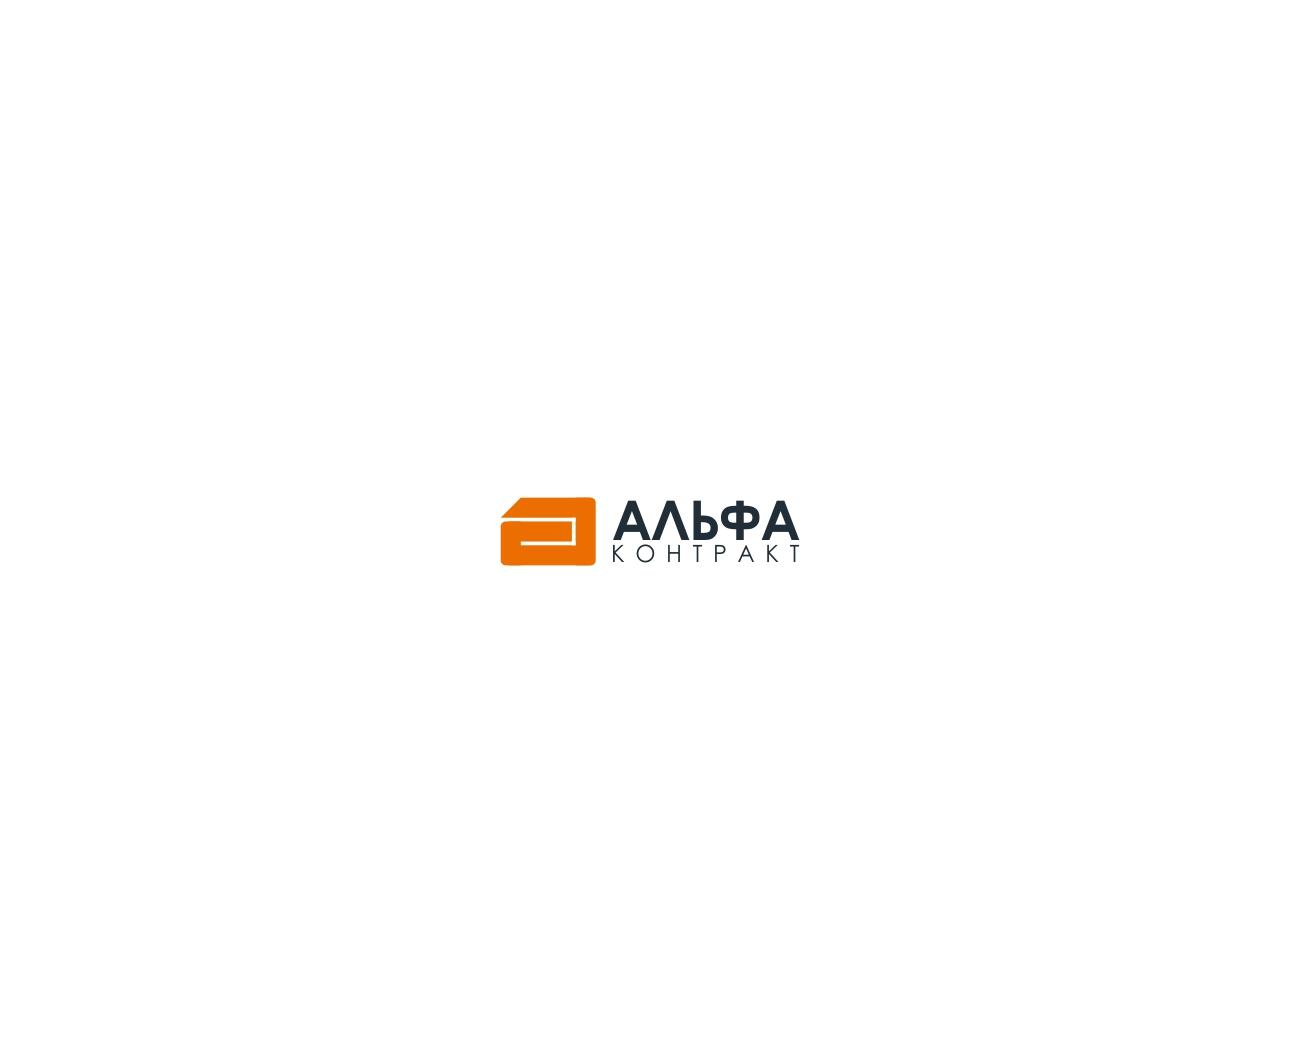 Дизайнер для разработки логотипа компании фото f_4575bfb2d2b78c0b.jpg